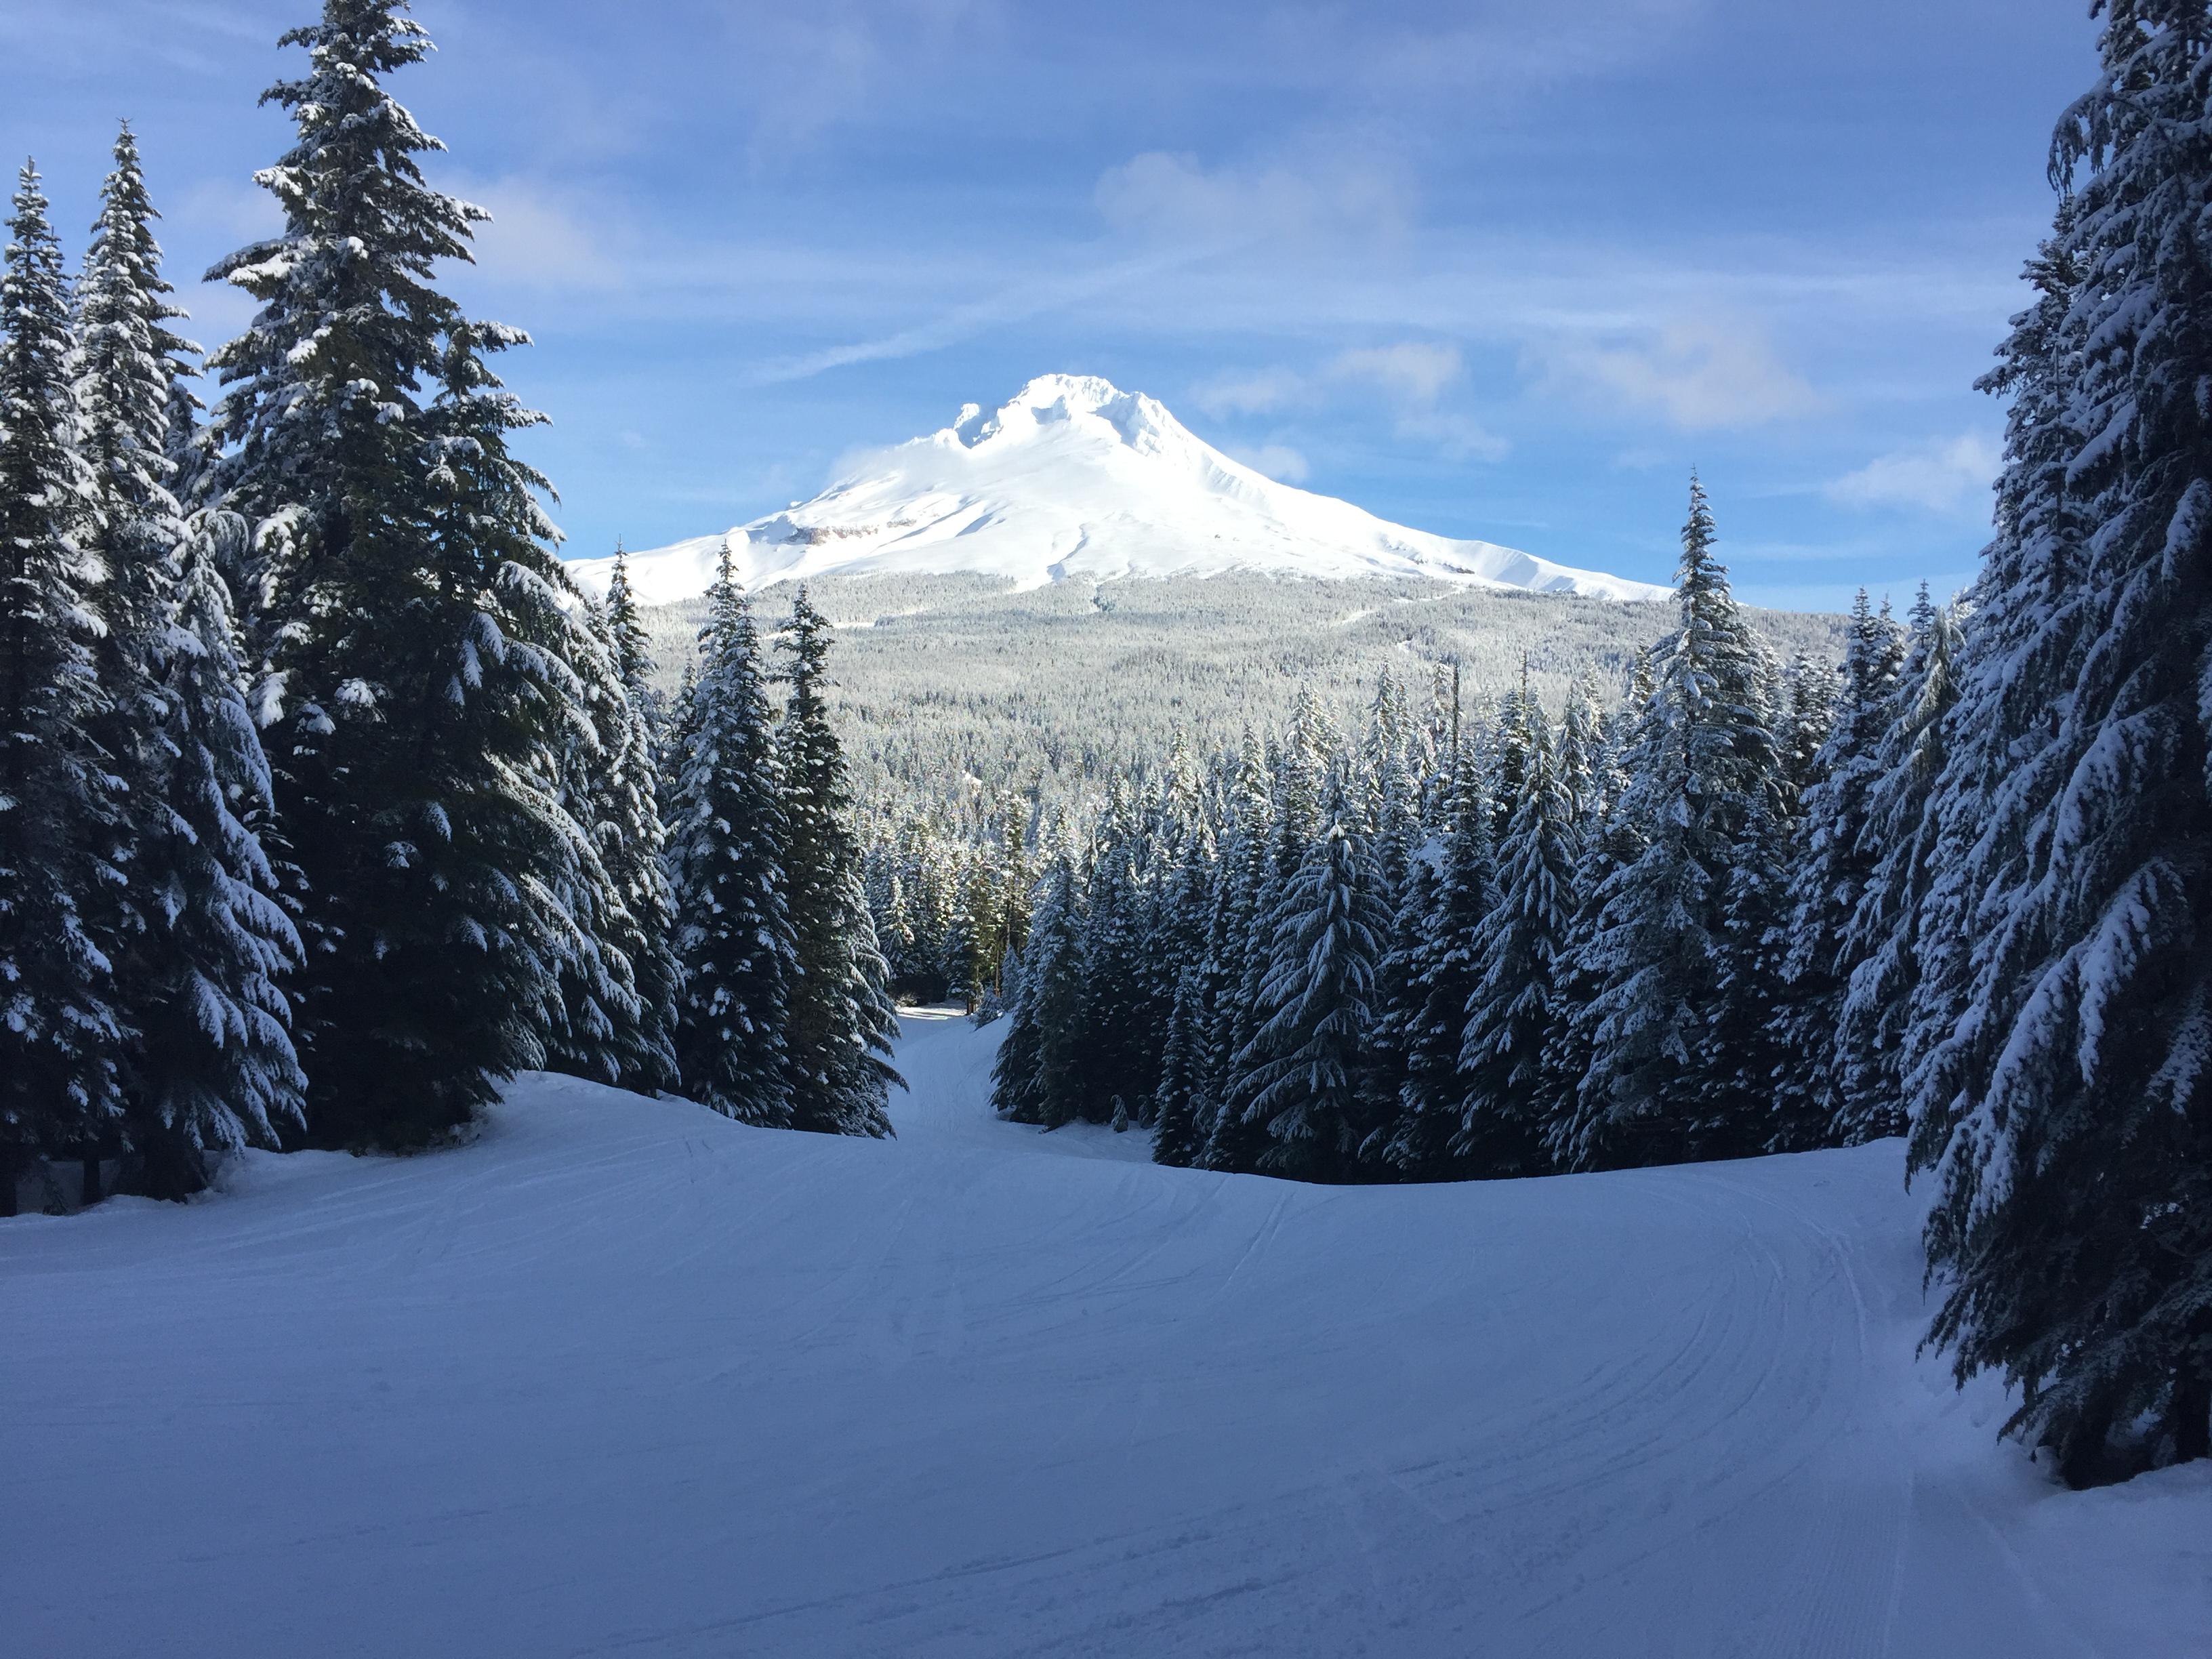 Off Multopor towards Mt. Hood, Mt Hood Ski Bowl